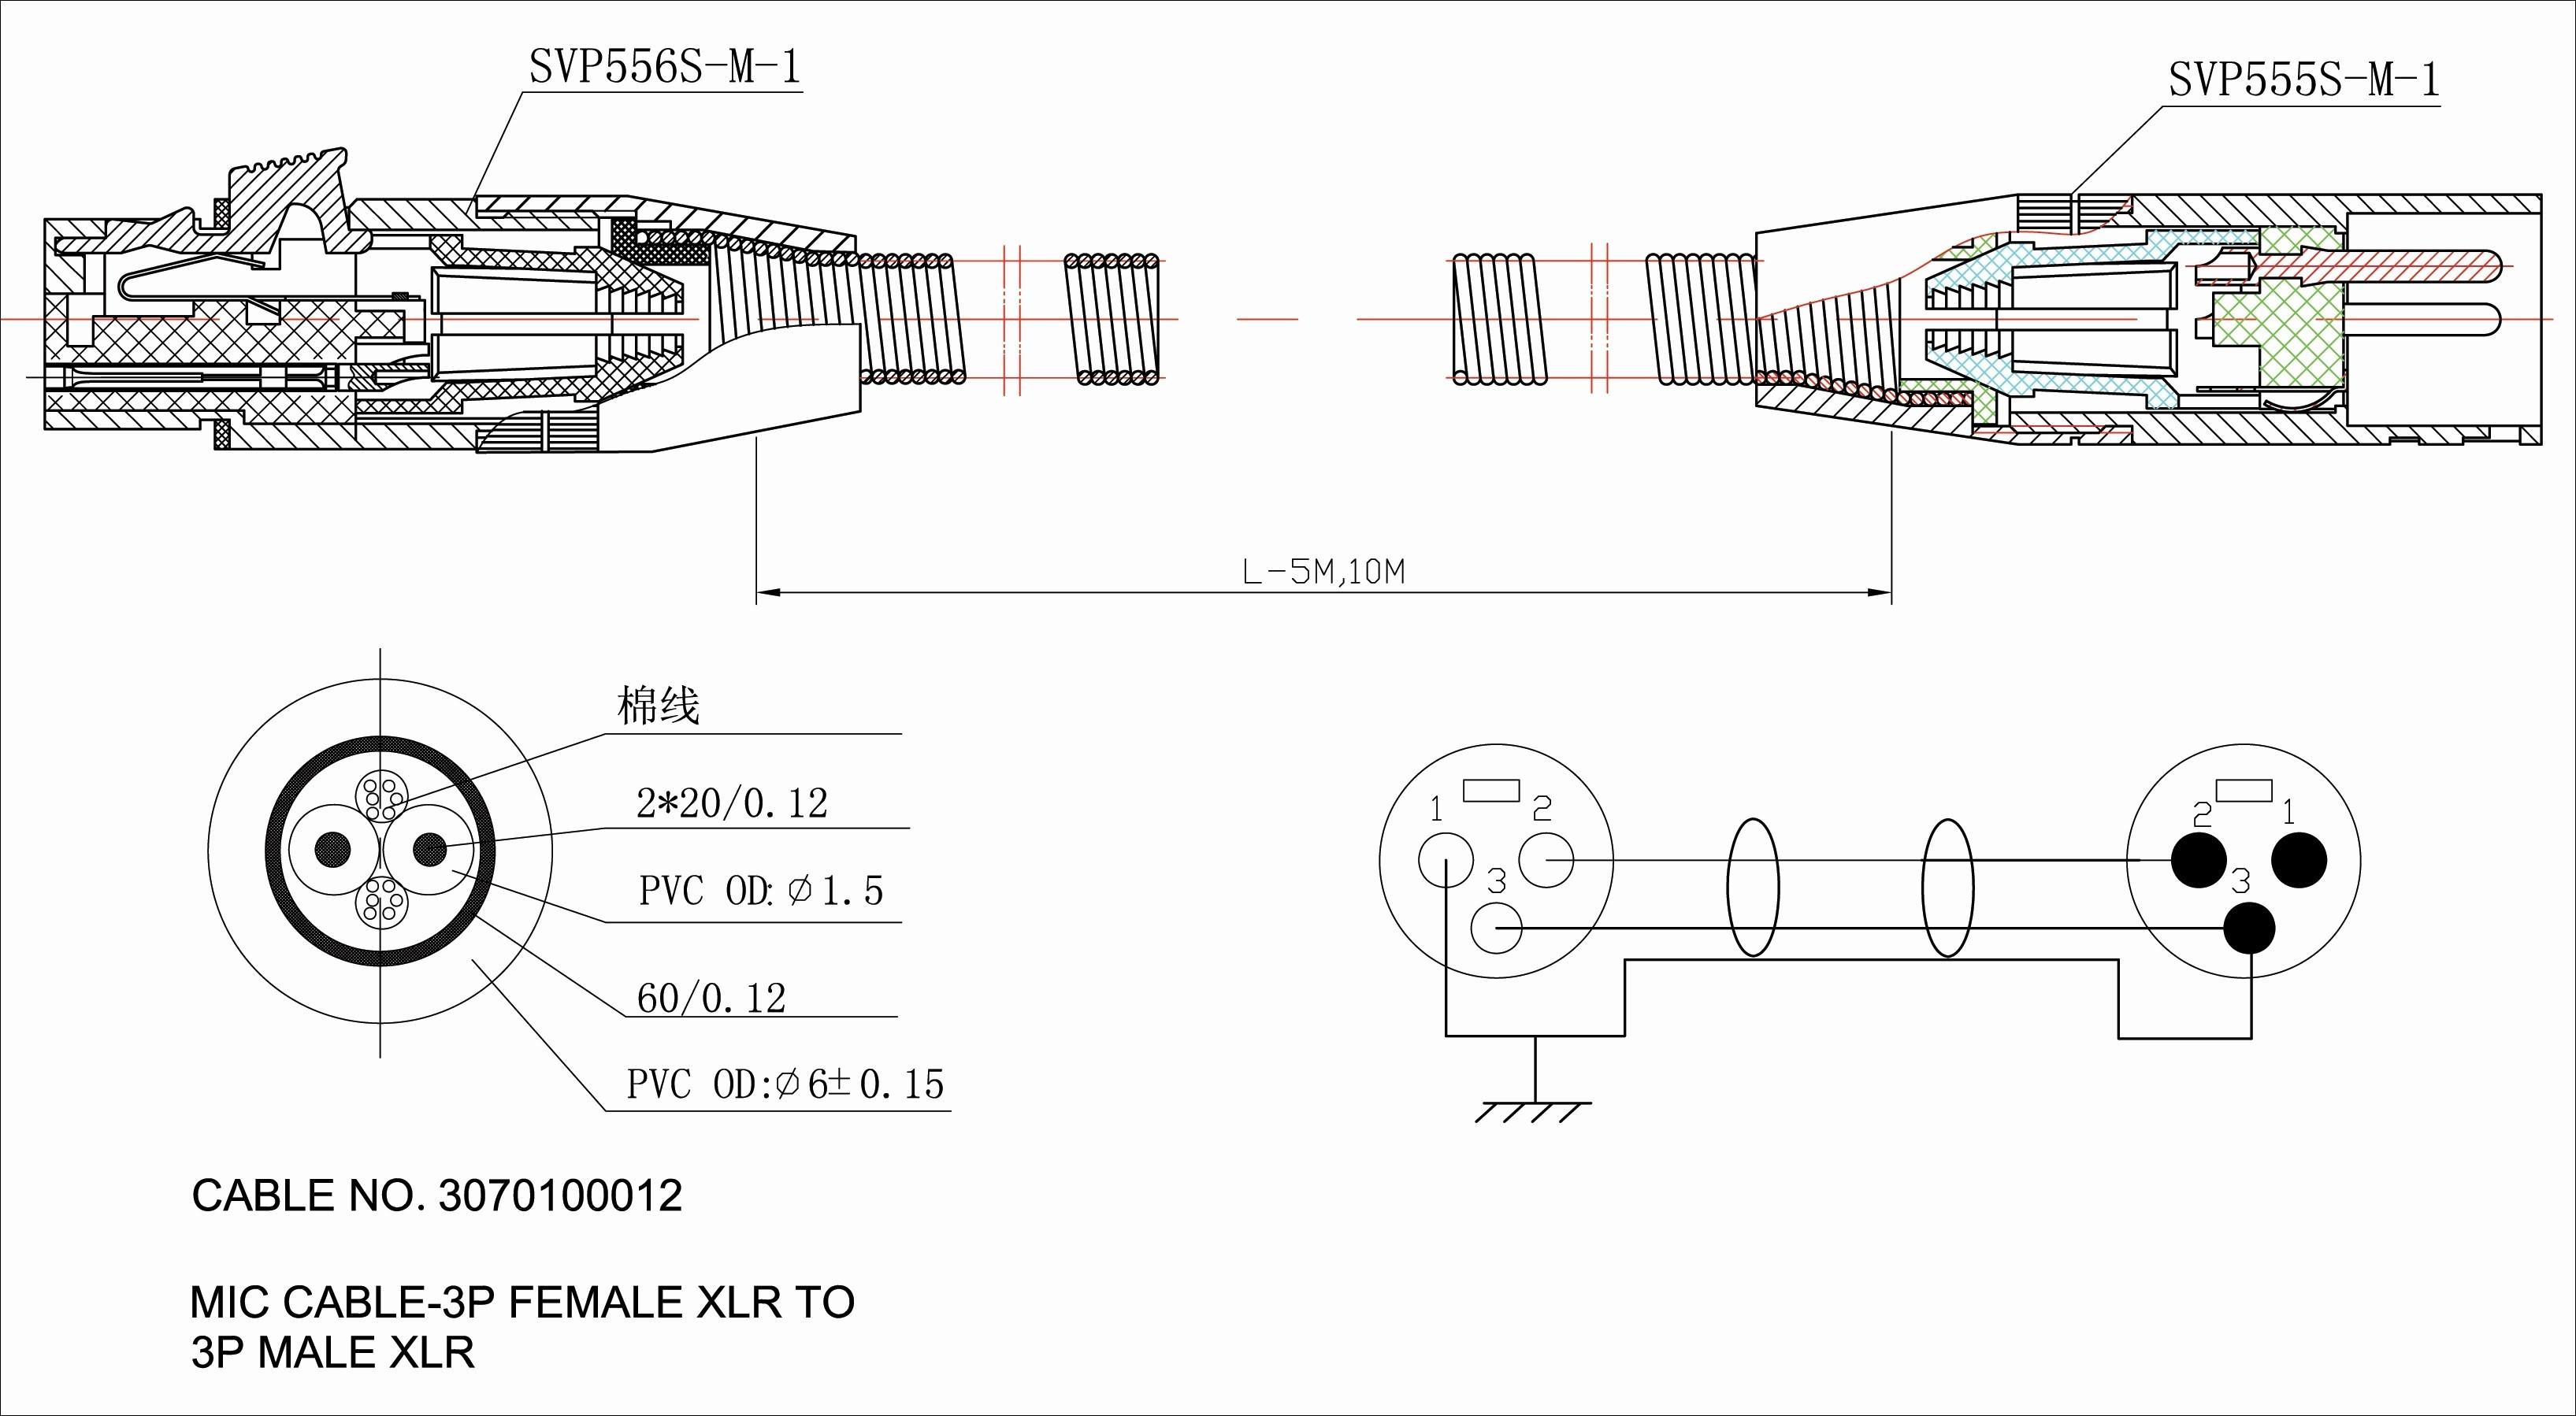 Kd R330 Wiring Harness Diagram - Data Wiring Diagram Today - Jvc Kdr330 Wiring Diagram